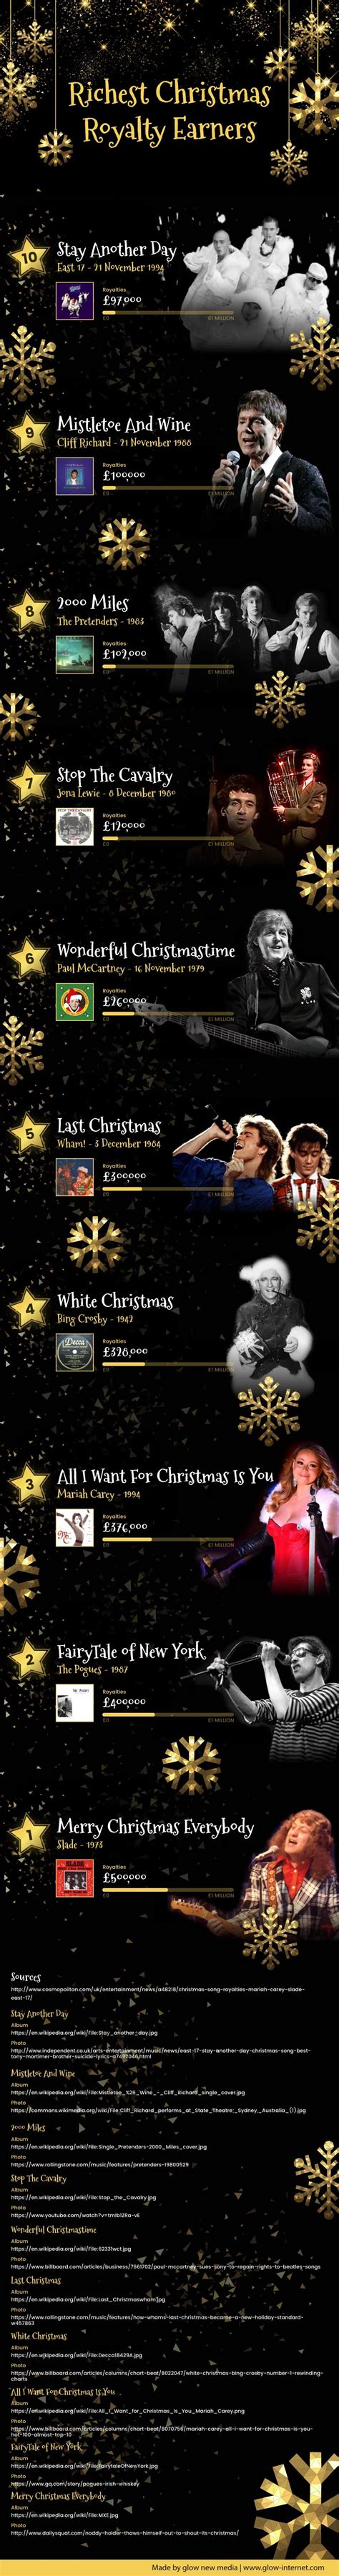 Best Uk Christmas Songs Venitism